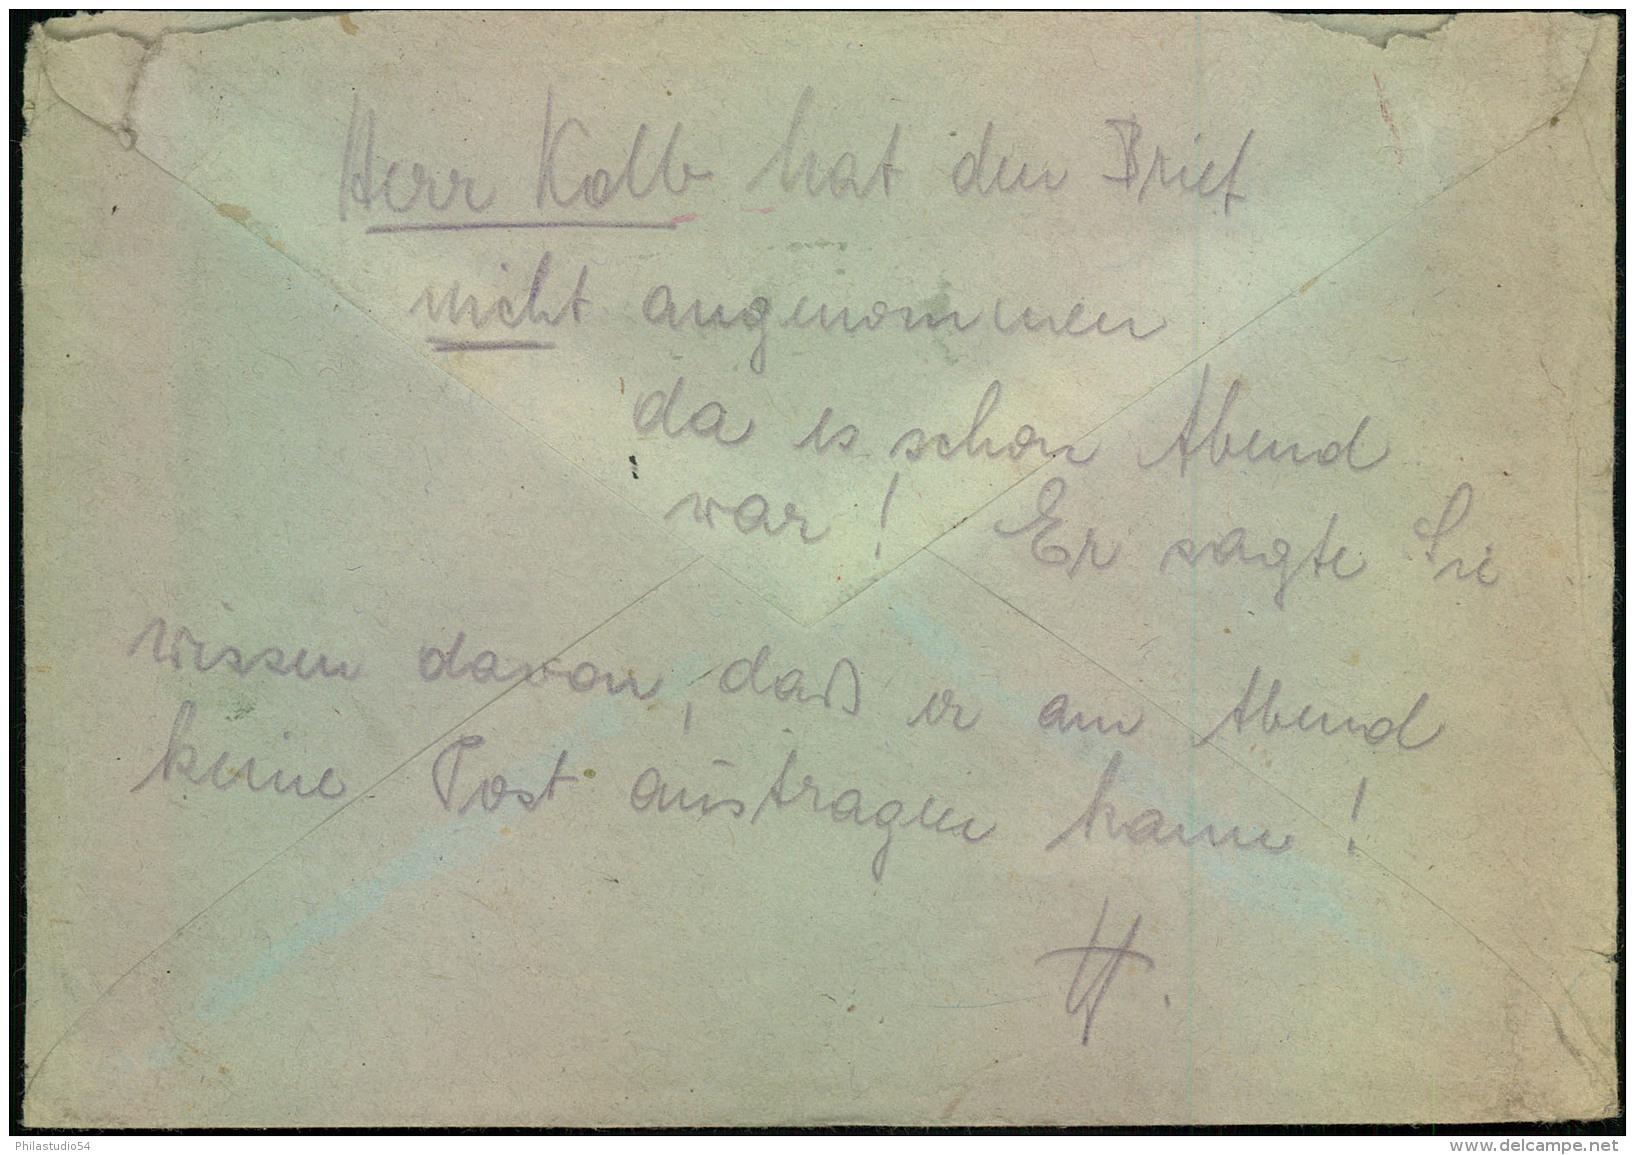 "1945, Feldpost-Einschreiben """"2. Admiral Der Nordsee"""" Ab BUXTEHUDE An """"Ortsgruppenleiter Der NSDAP"""" In Burglengenfeld - Alemania"